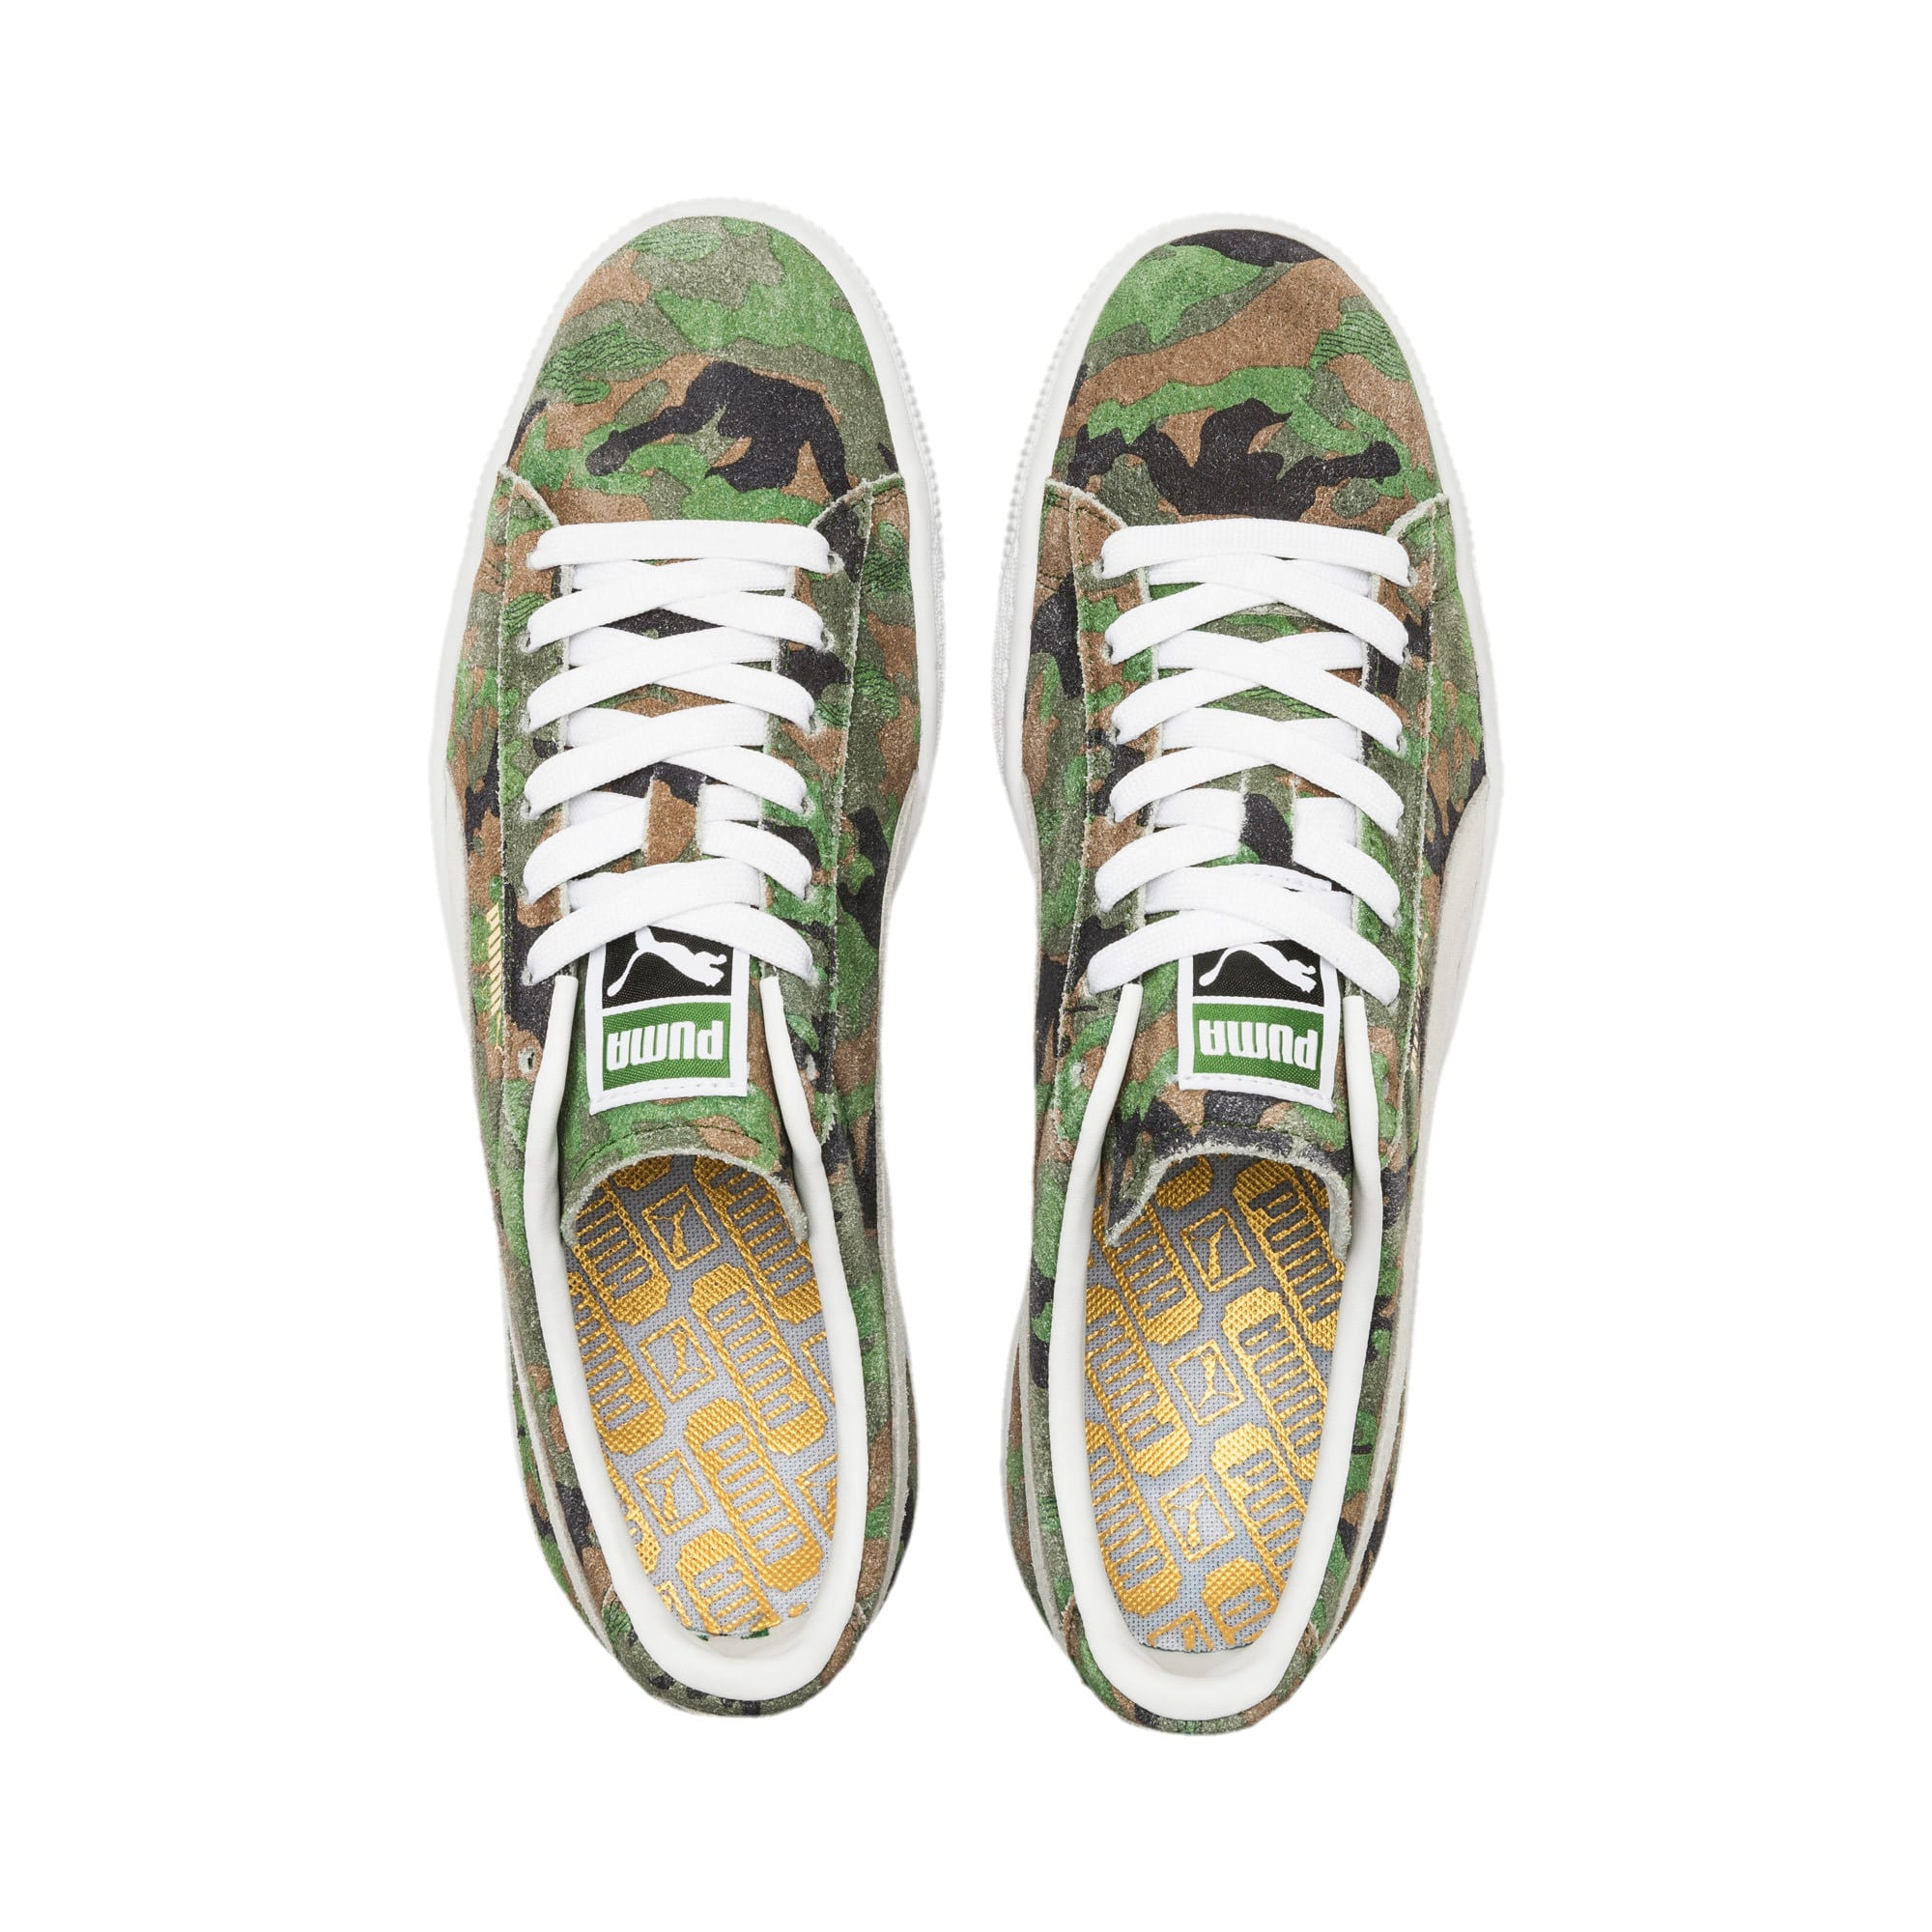 Thumbnail 6 of Suede Classic Ambush Sneakers, Dachsund-Green-Black-White, medium